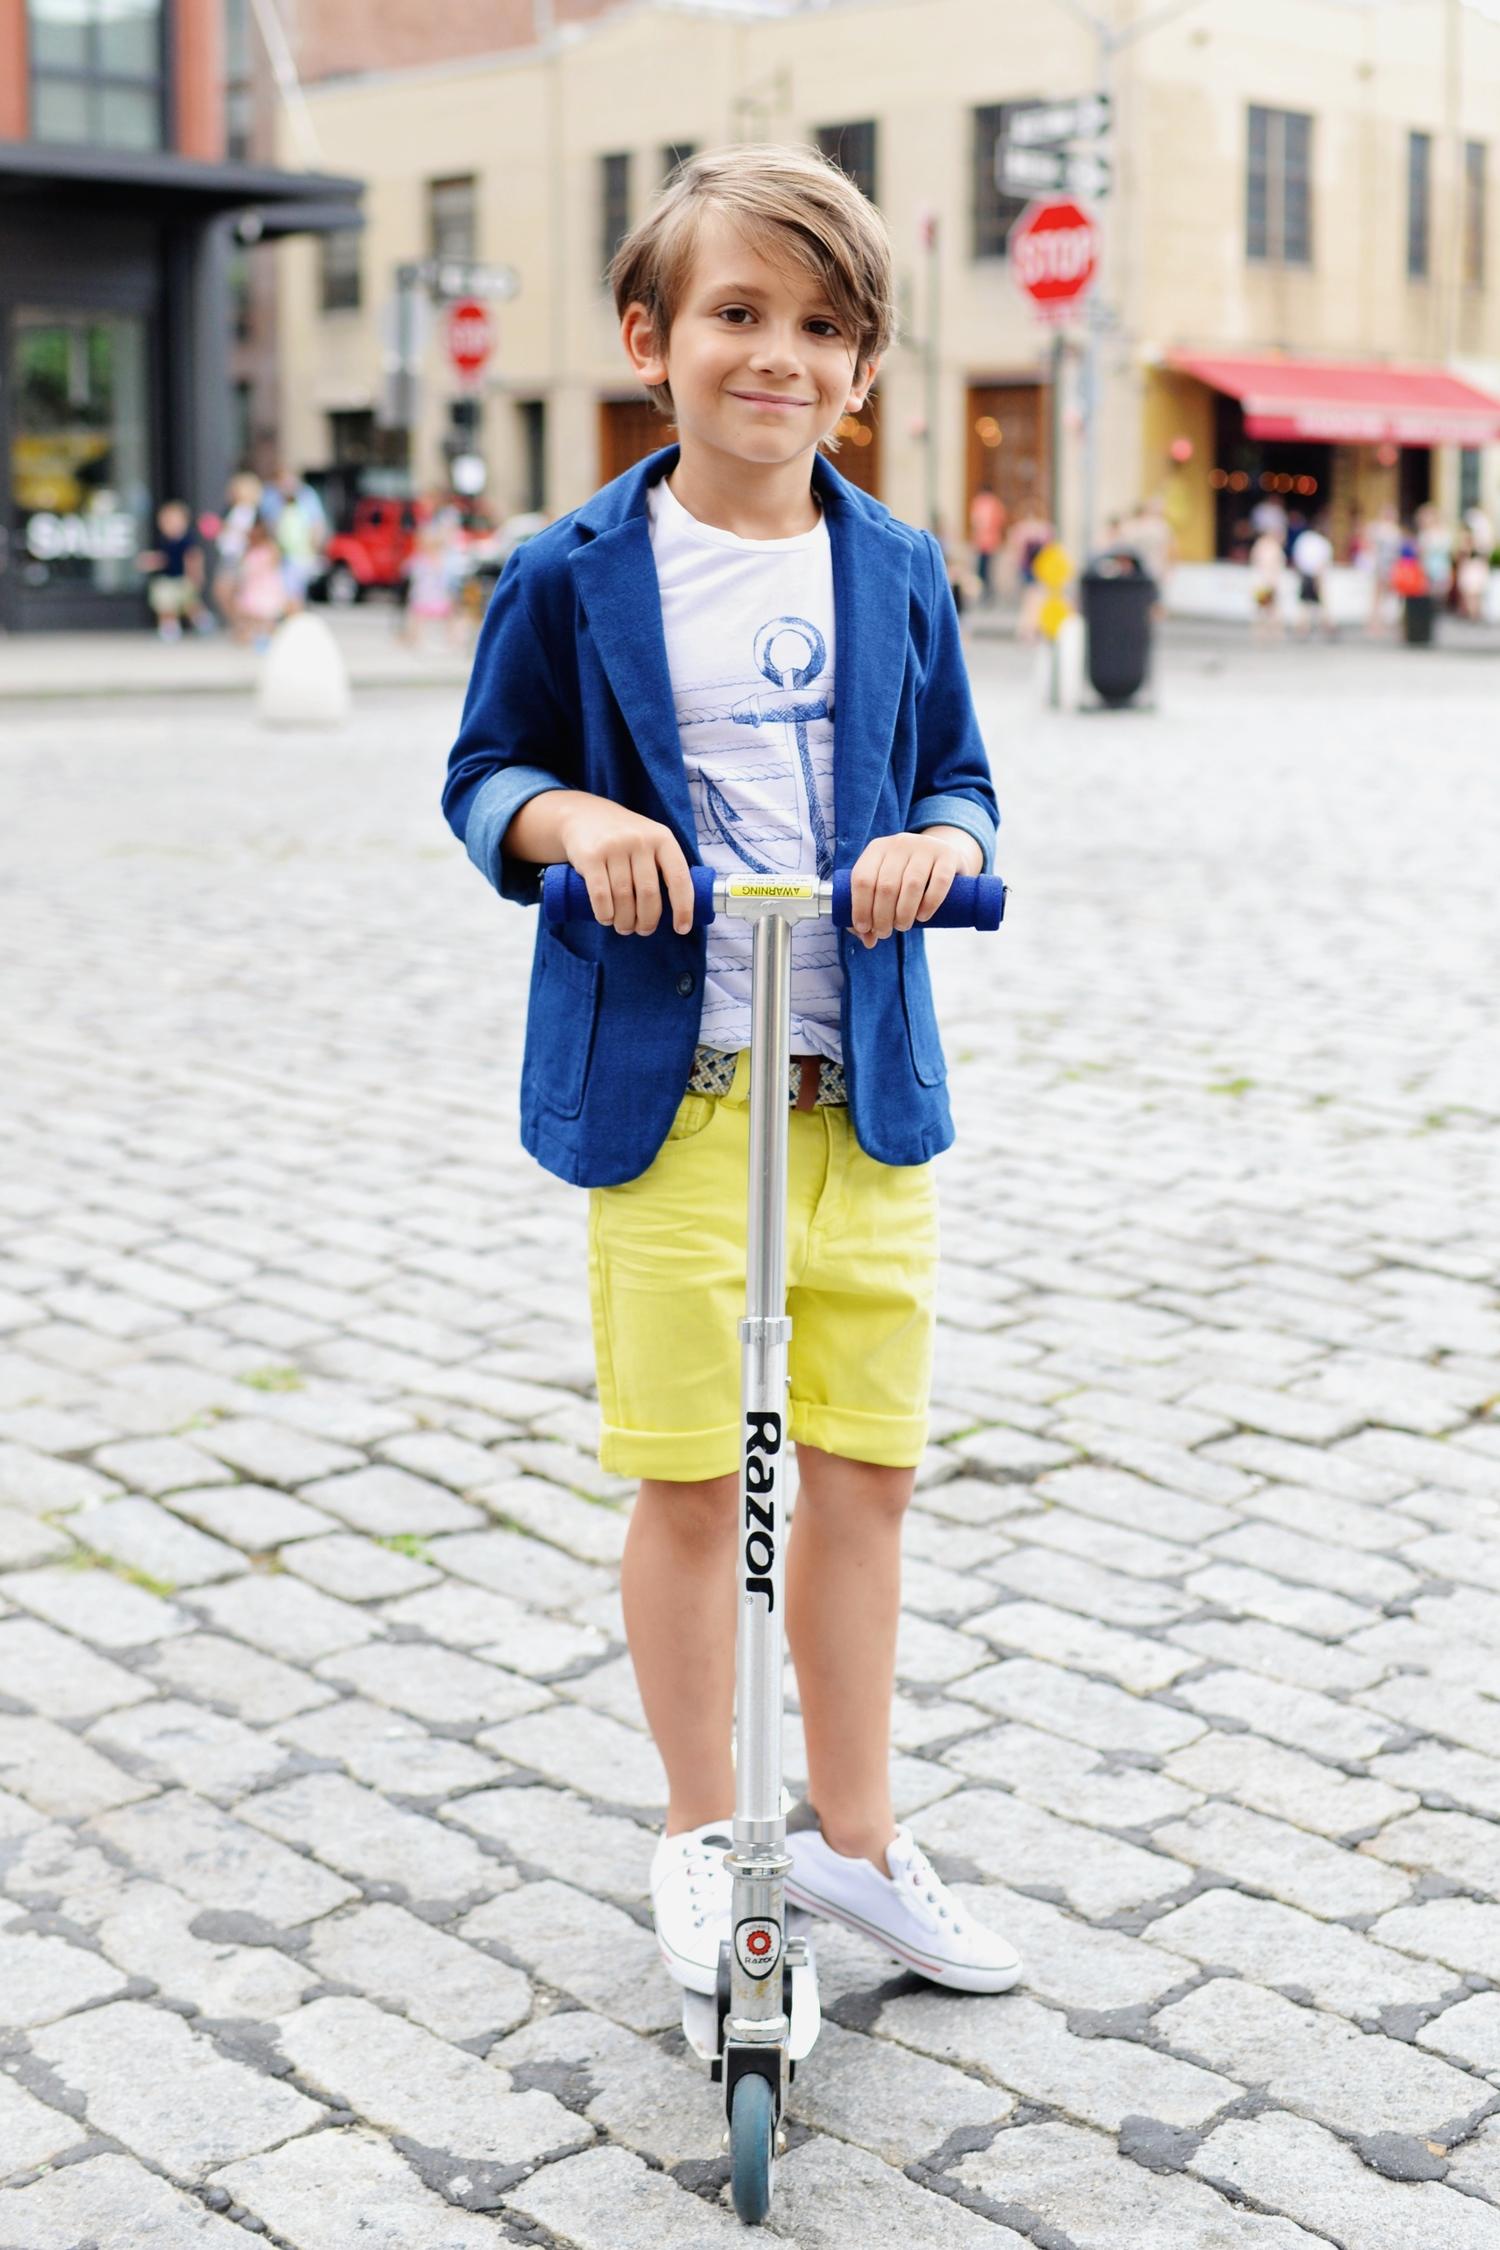 Enfant+Street+Style+by+Gina+Kim+Photography-61.jpeg